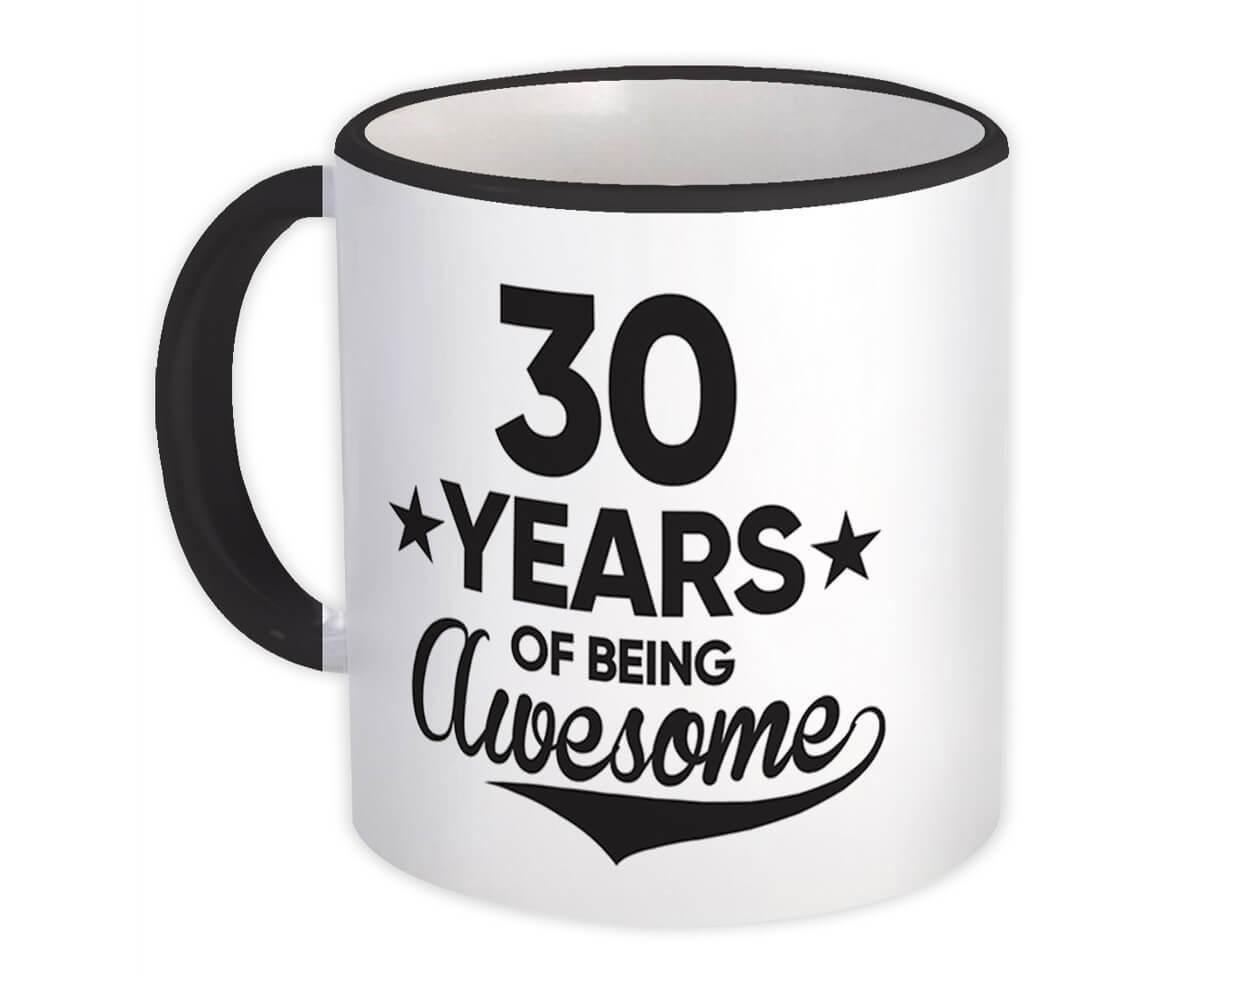 30 Years of Being Awesome : Gift Mug 30th Birthday Baseball Script Happy Cute